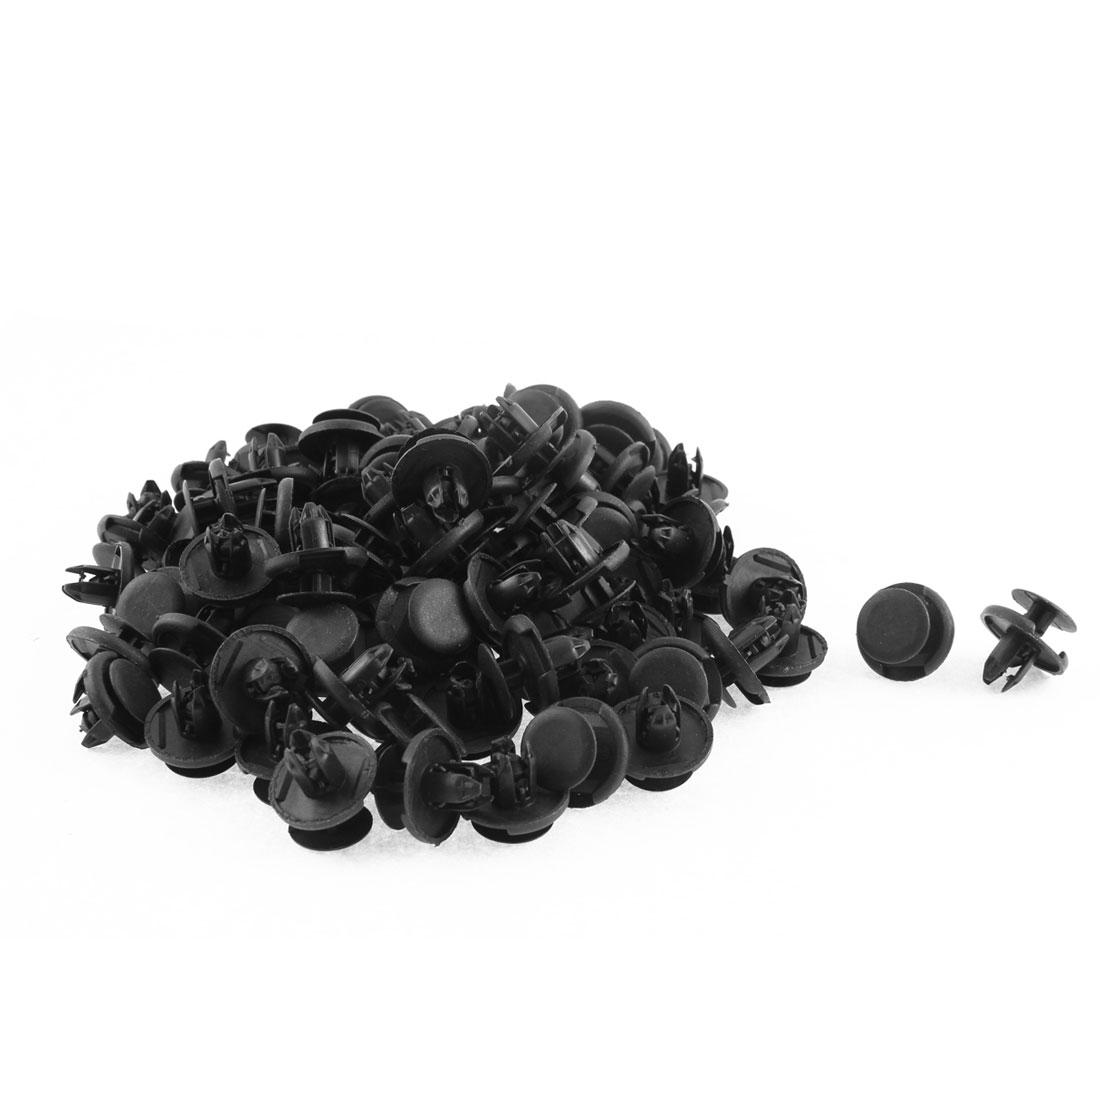 100 Pcs 20mm x 8mm Black Plastic Push-Type Rivets Fastener Fender Clips